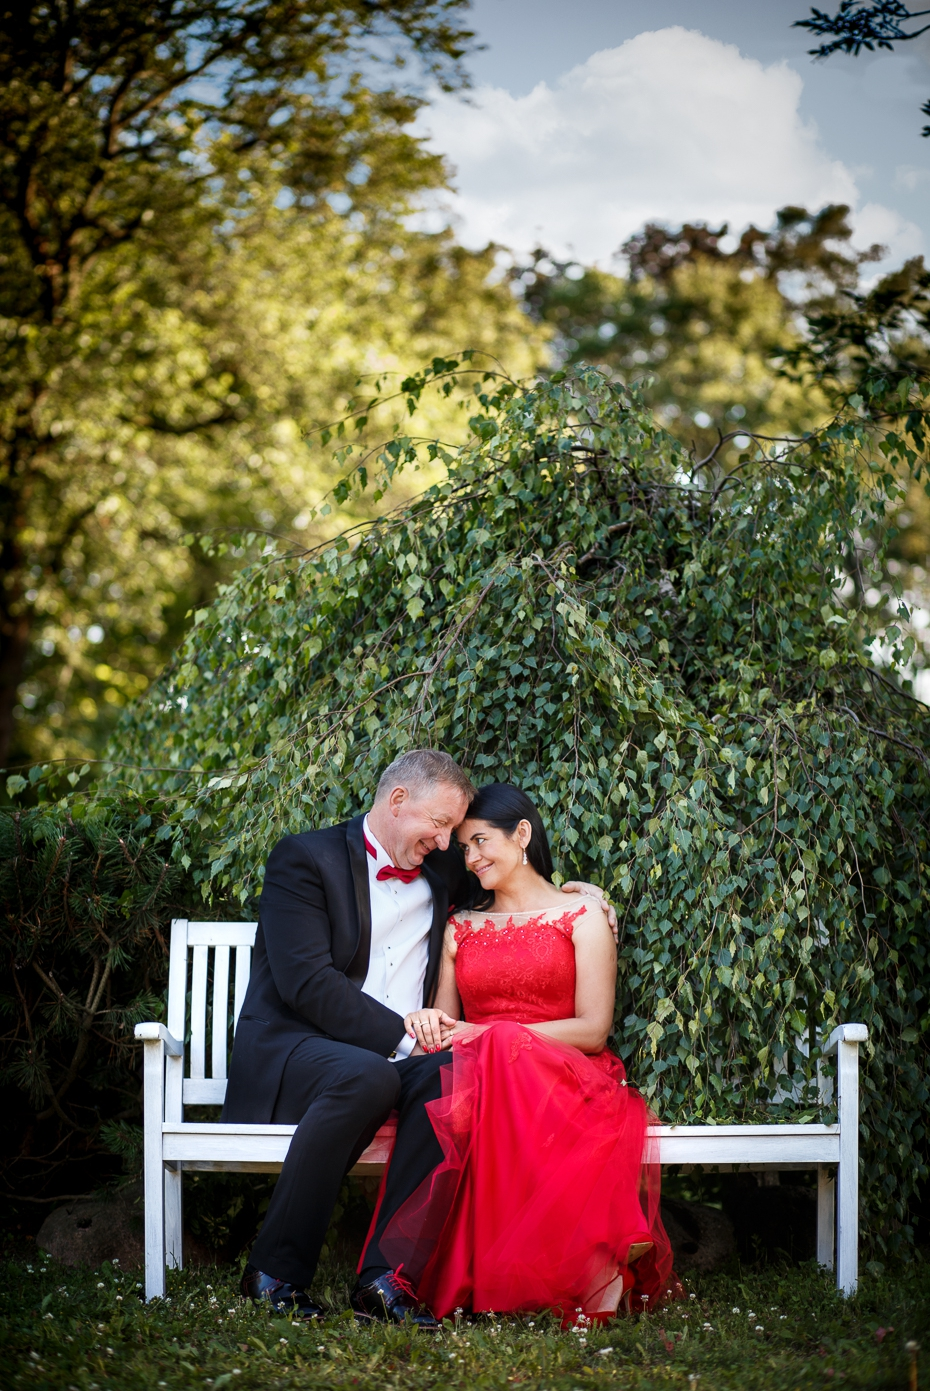 059_destination_wedding_photographer_london_blog_930p